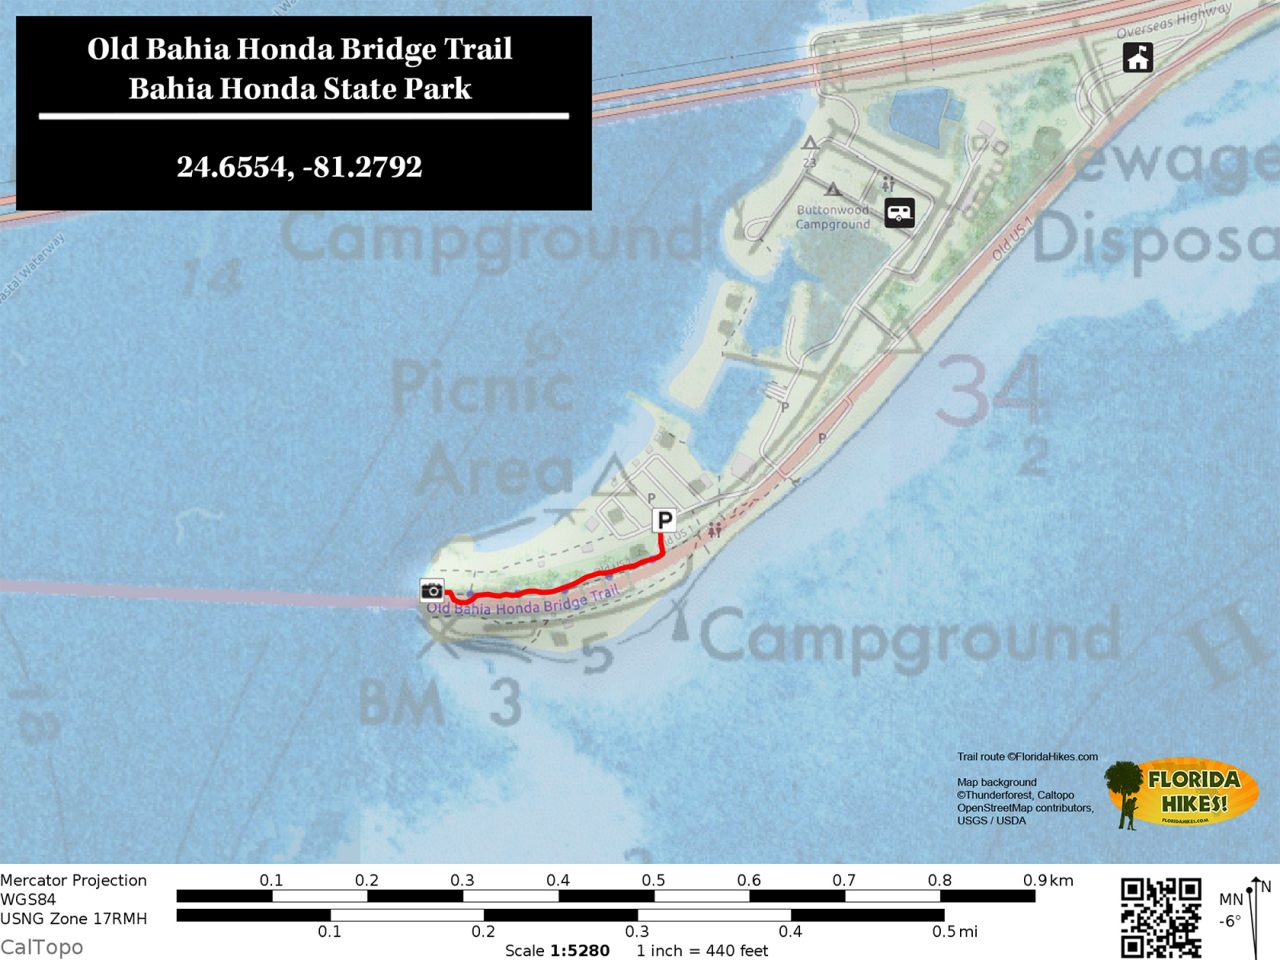 Old Bahia Honda Bridge Trail Map